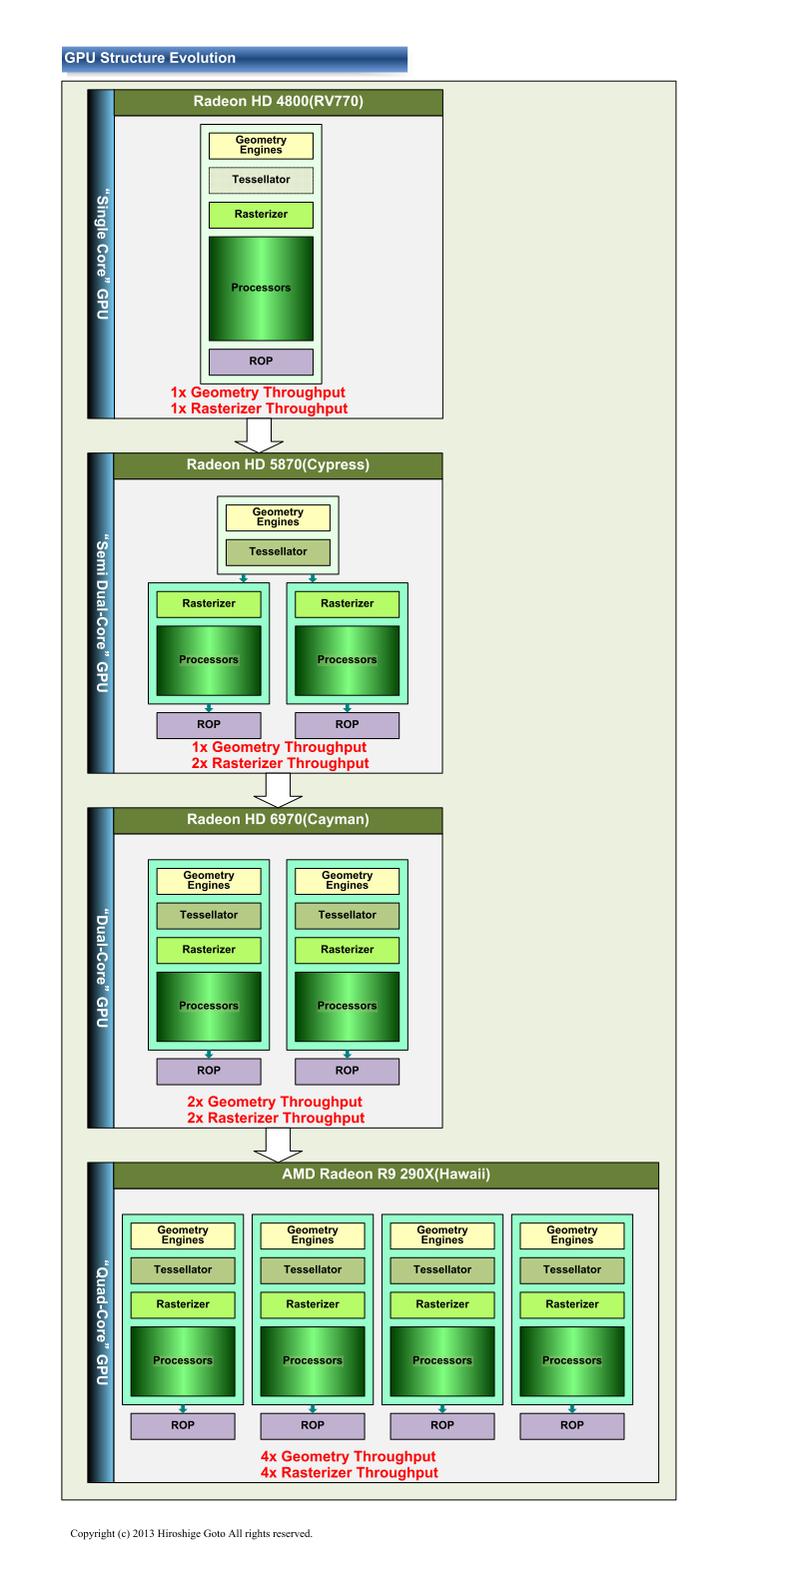 "AMD GPUのマルチコア化の動き(PDF版は<span class=""img-inline raw""><a href=""/video/pcw/docs/621/310/07p.pdf"" ipw_status=""1"" ipw_linktype=""filelink_raw"" class=""resource"">こちら</a></span>)"